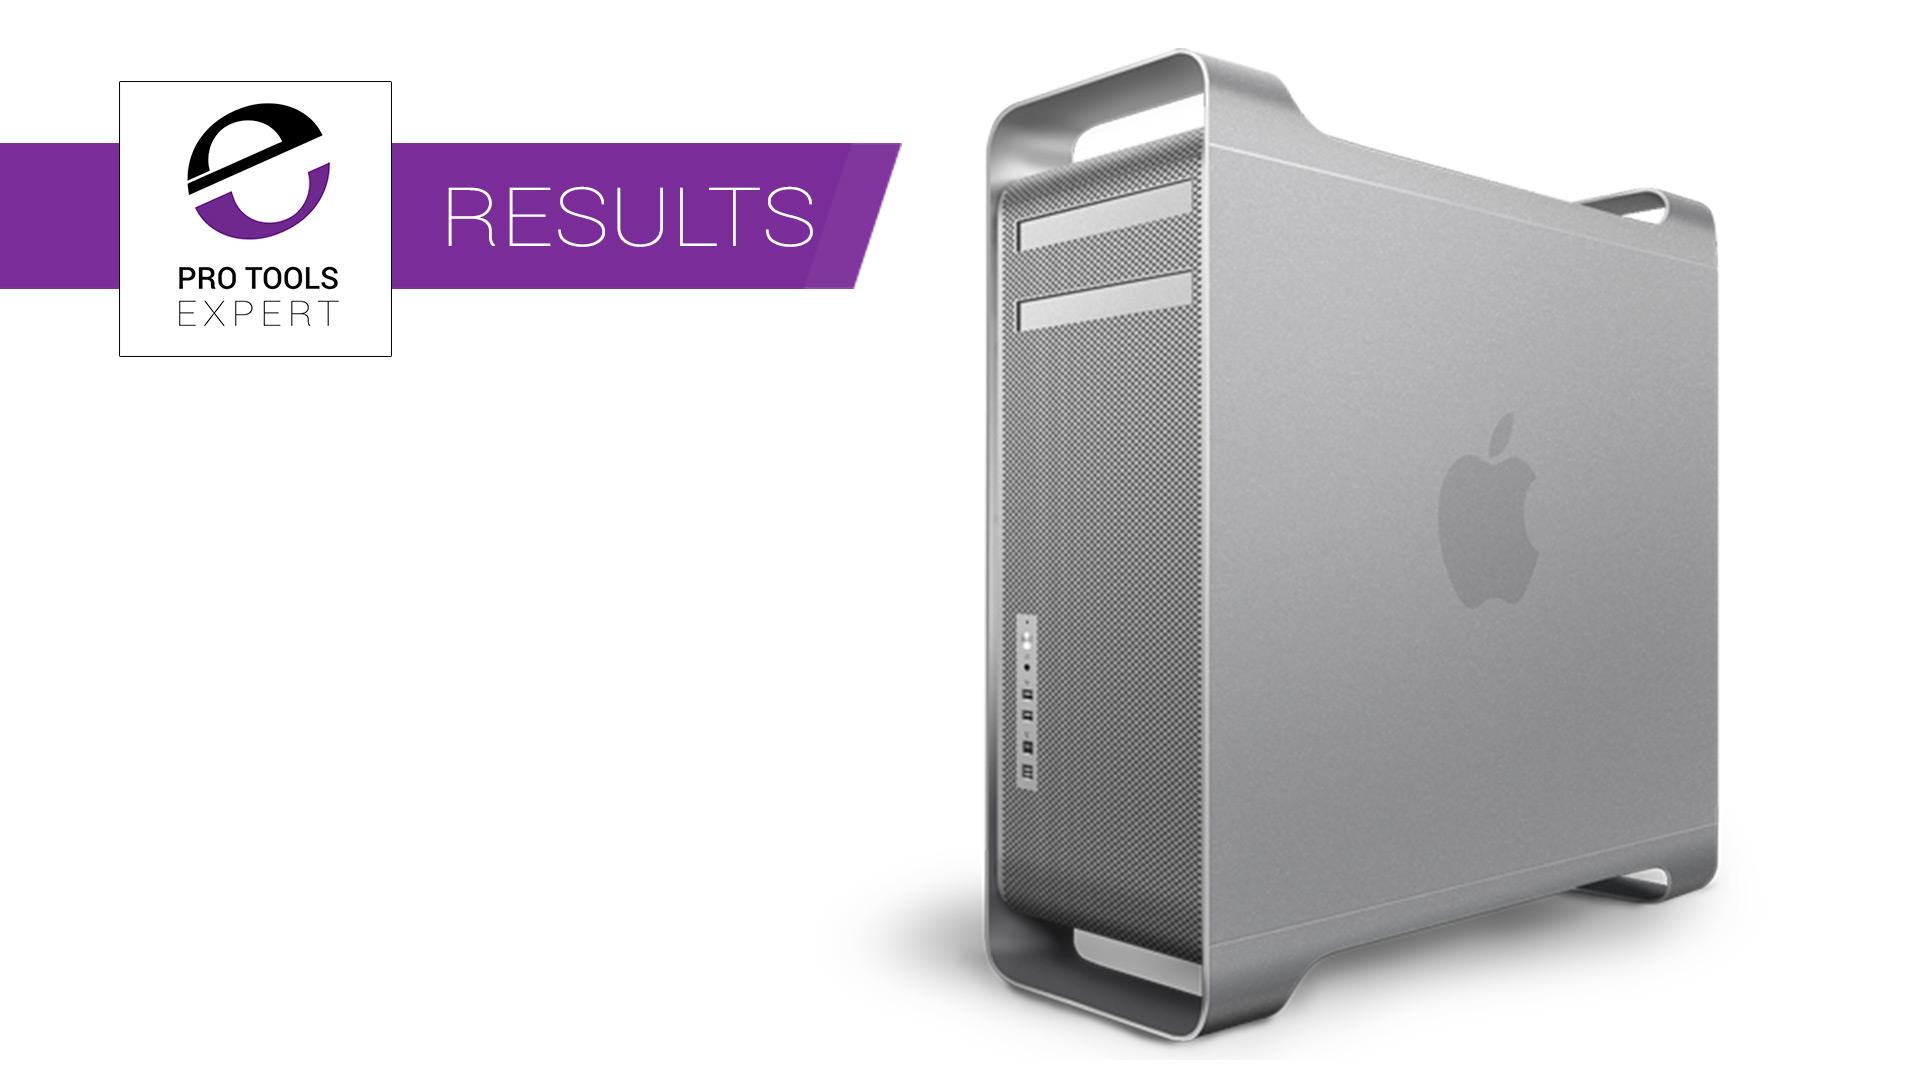 apple-mac-pro-5.1-replacement-mac-pro-7.1-modular-pro-tools-computer.jpg